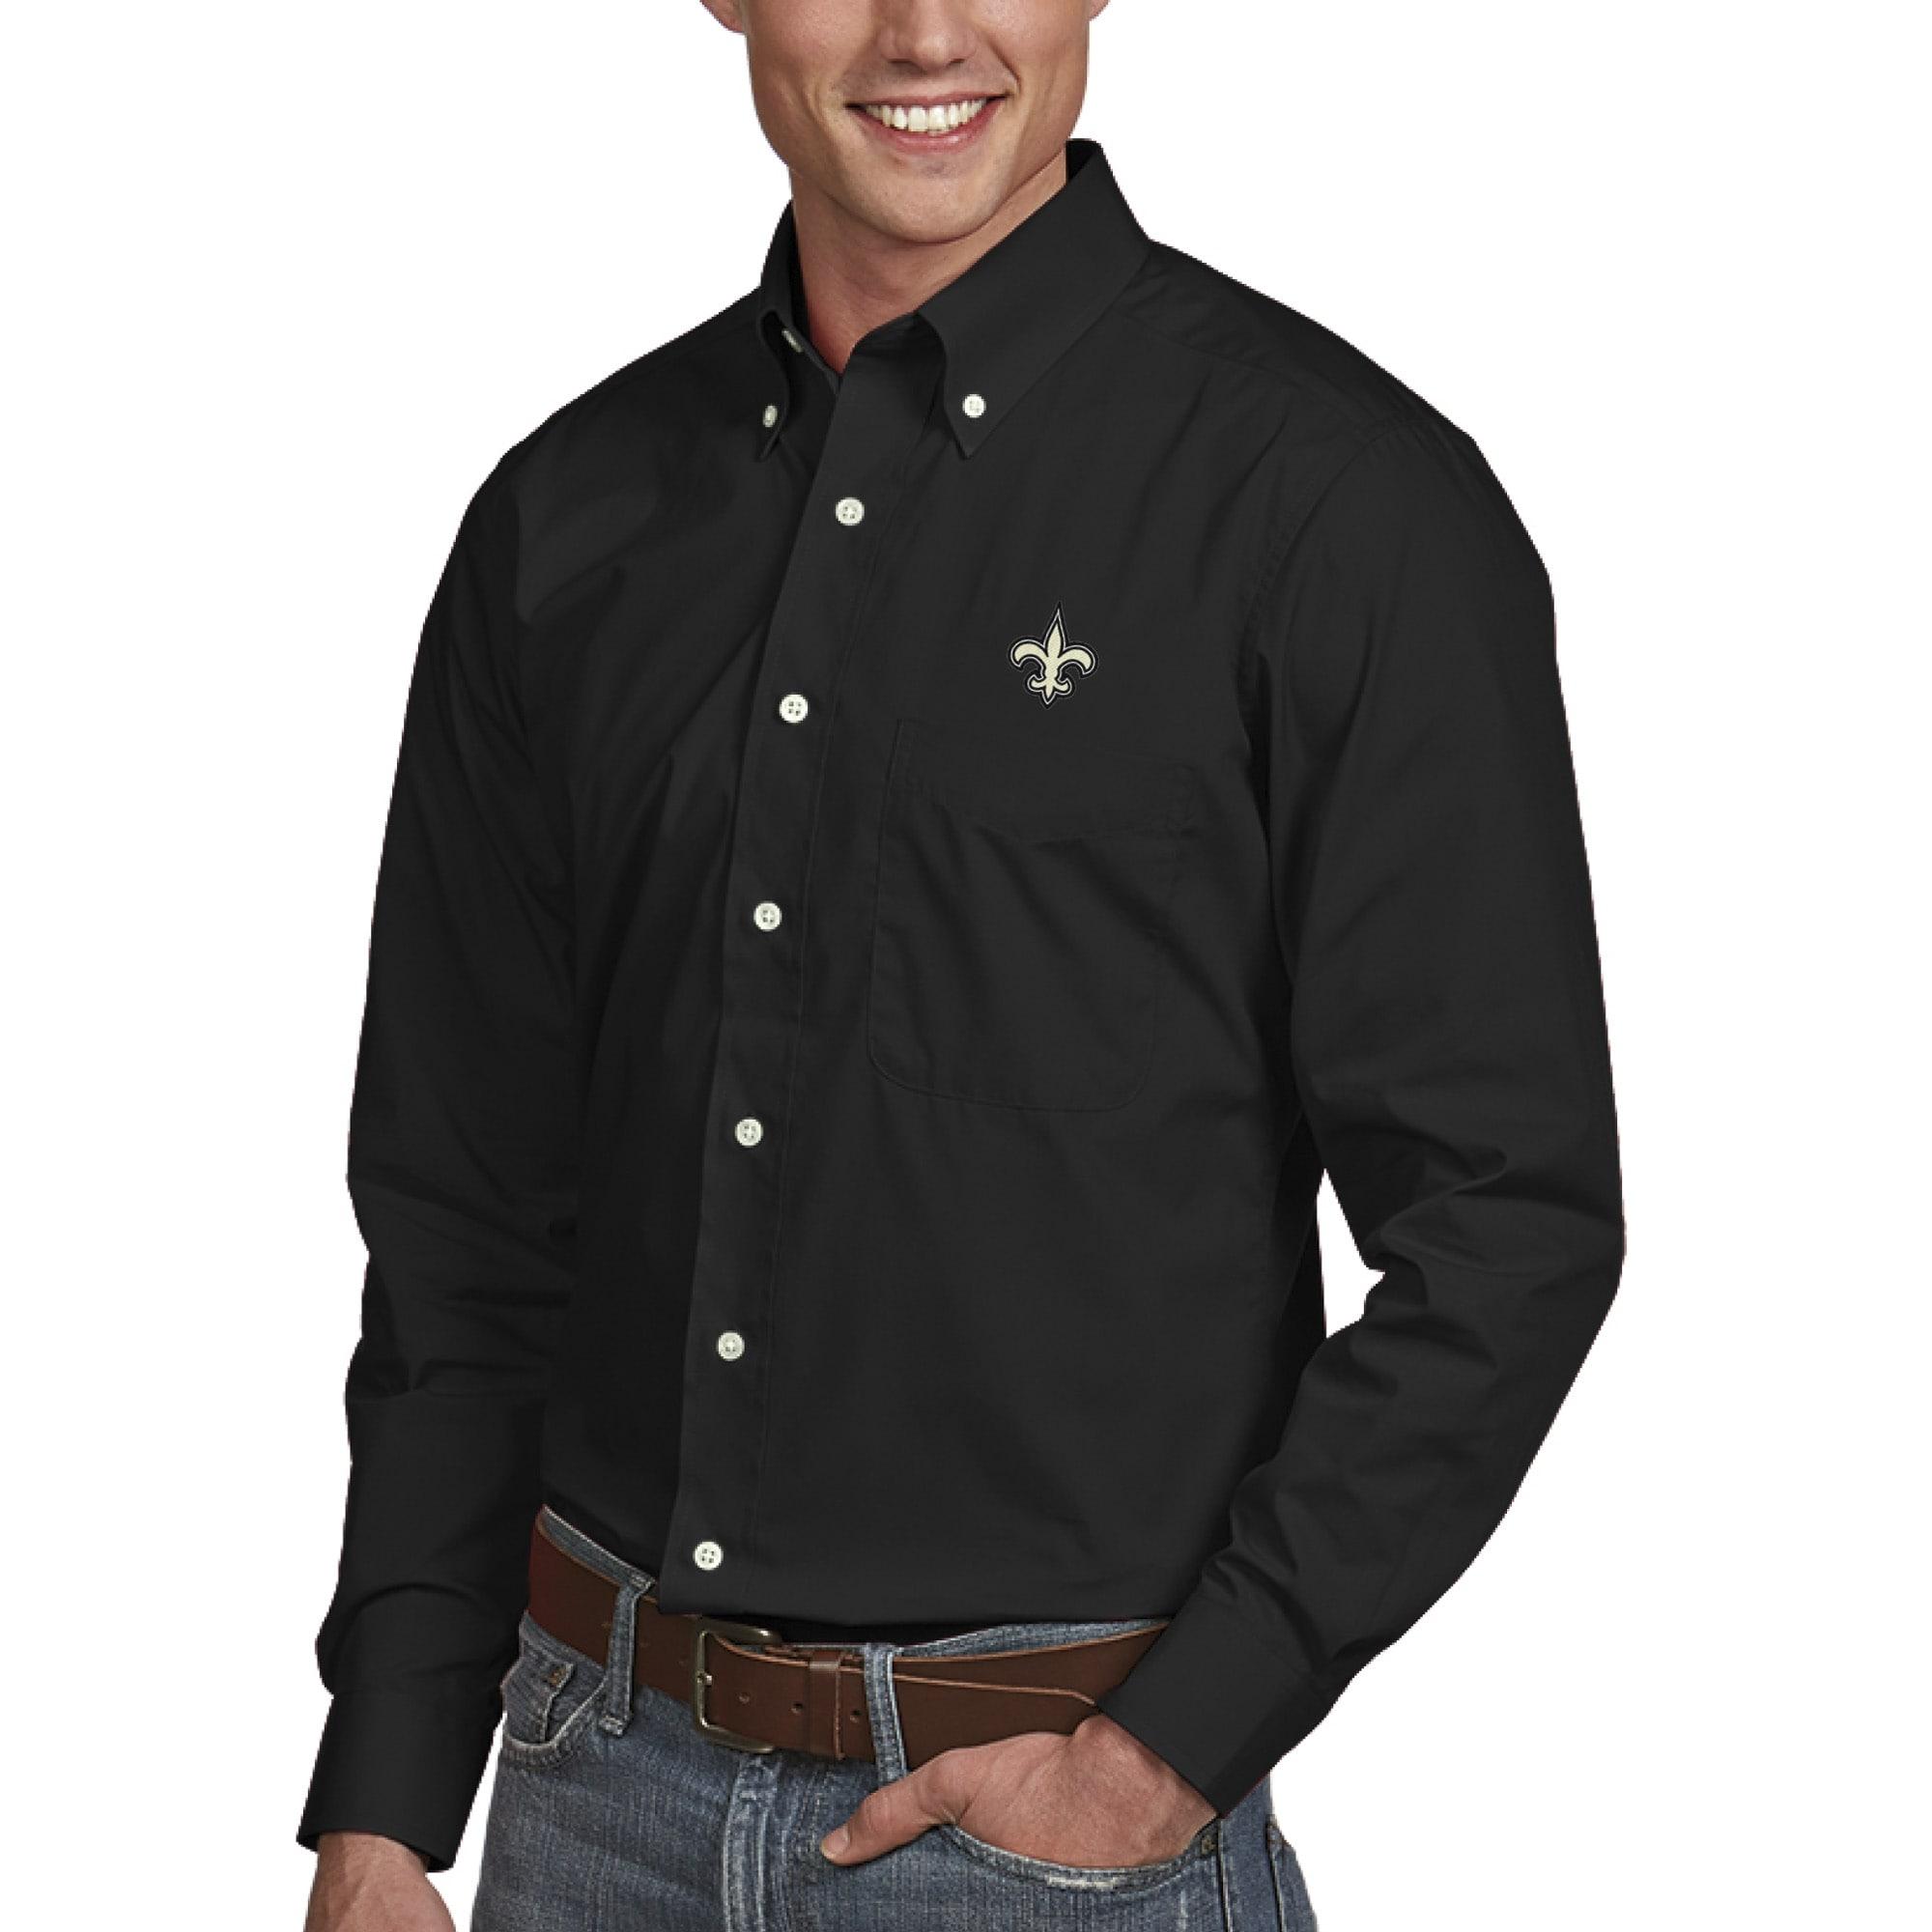 New Orleans Saints Antigua Dynasty Woven Long Sleeve Shirt - Black